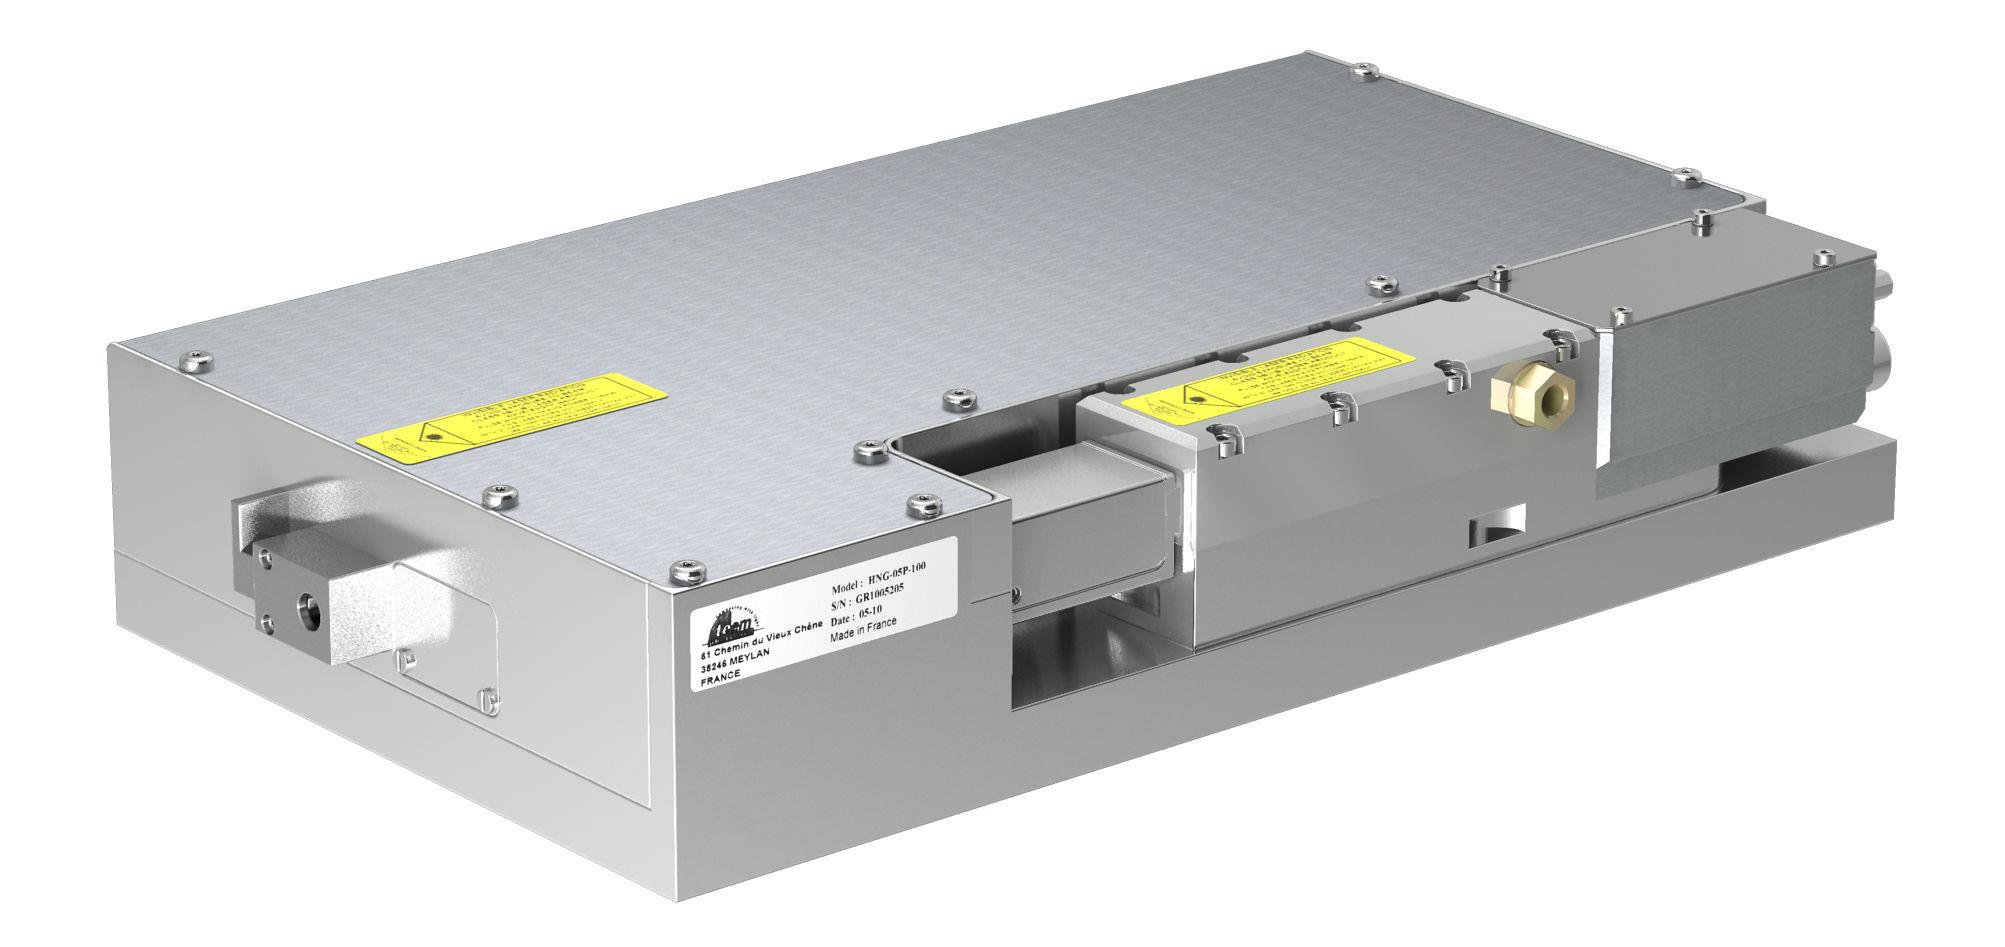 Pico-Second Laser